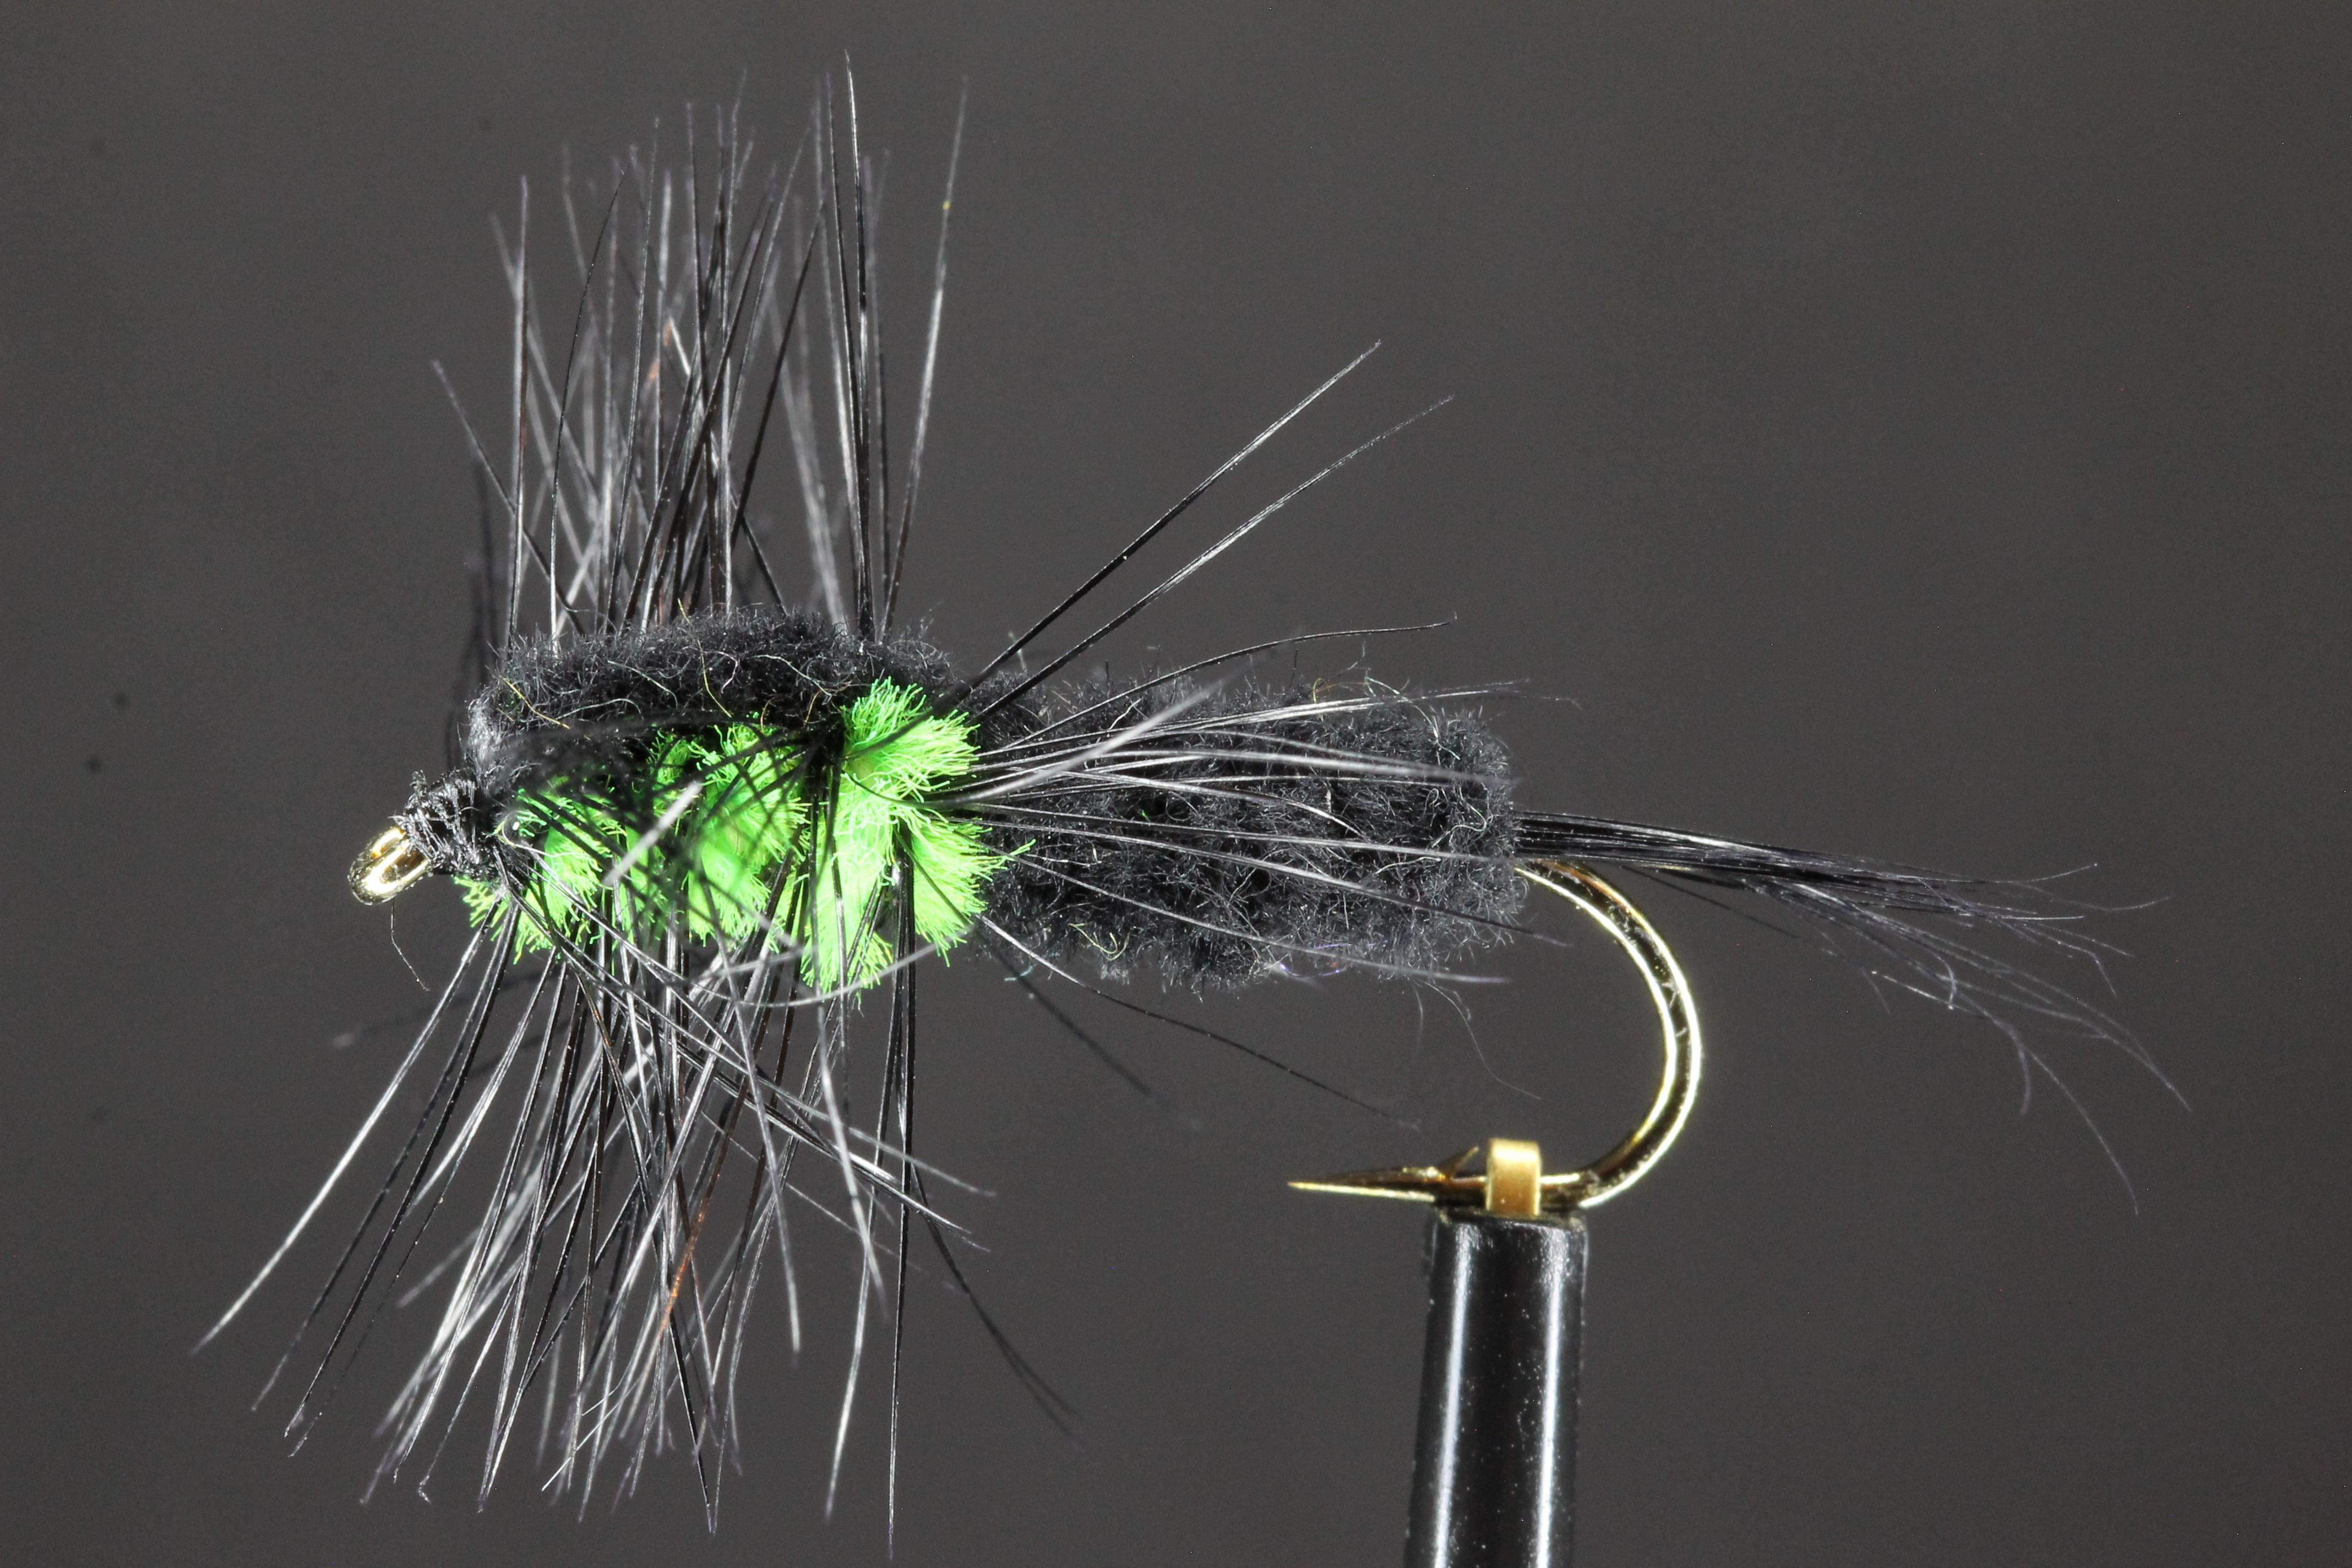 Long shank Green Montana